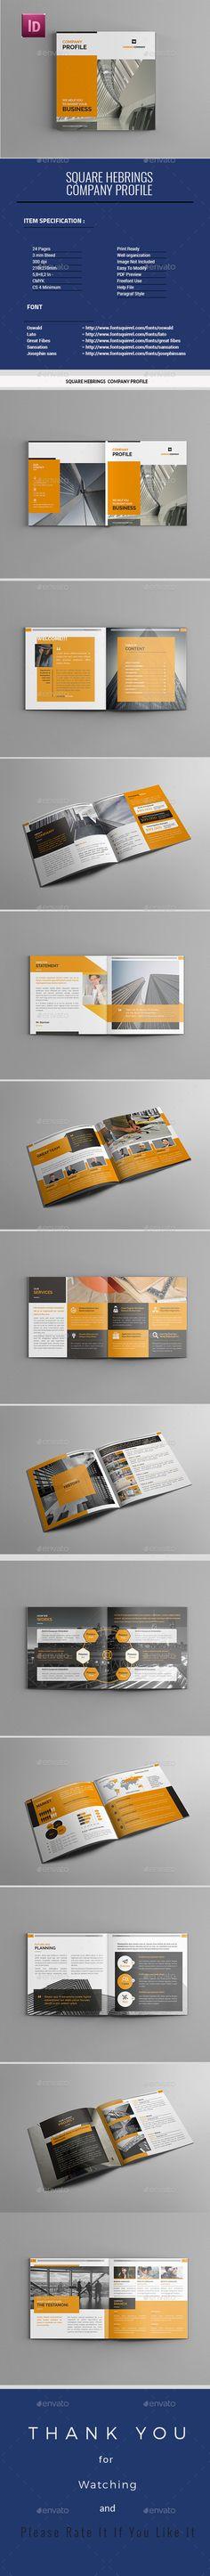 Company Profile - #Corporate #Brochures Download here: https://graphicriver.net/item/company-profile/19514014?ref=alena994